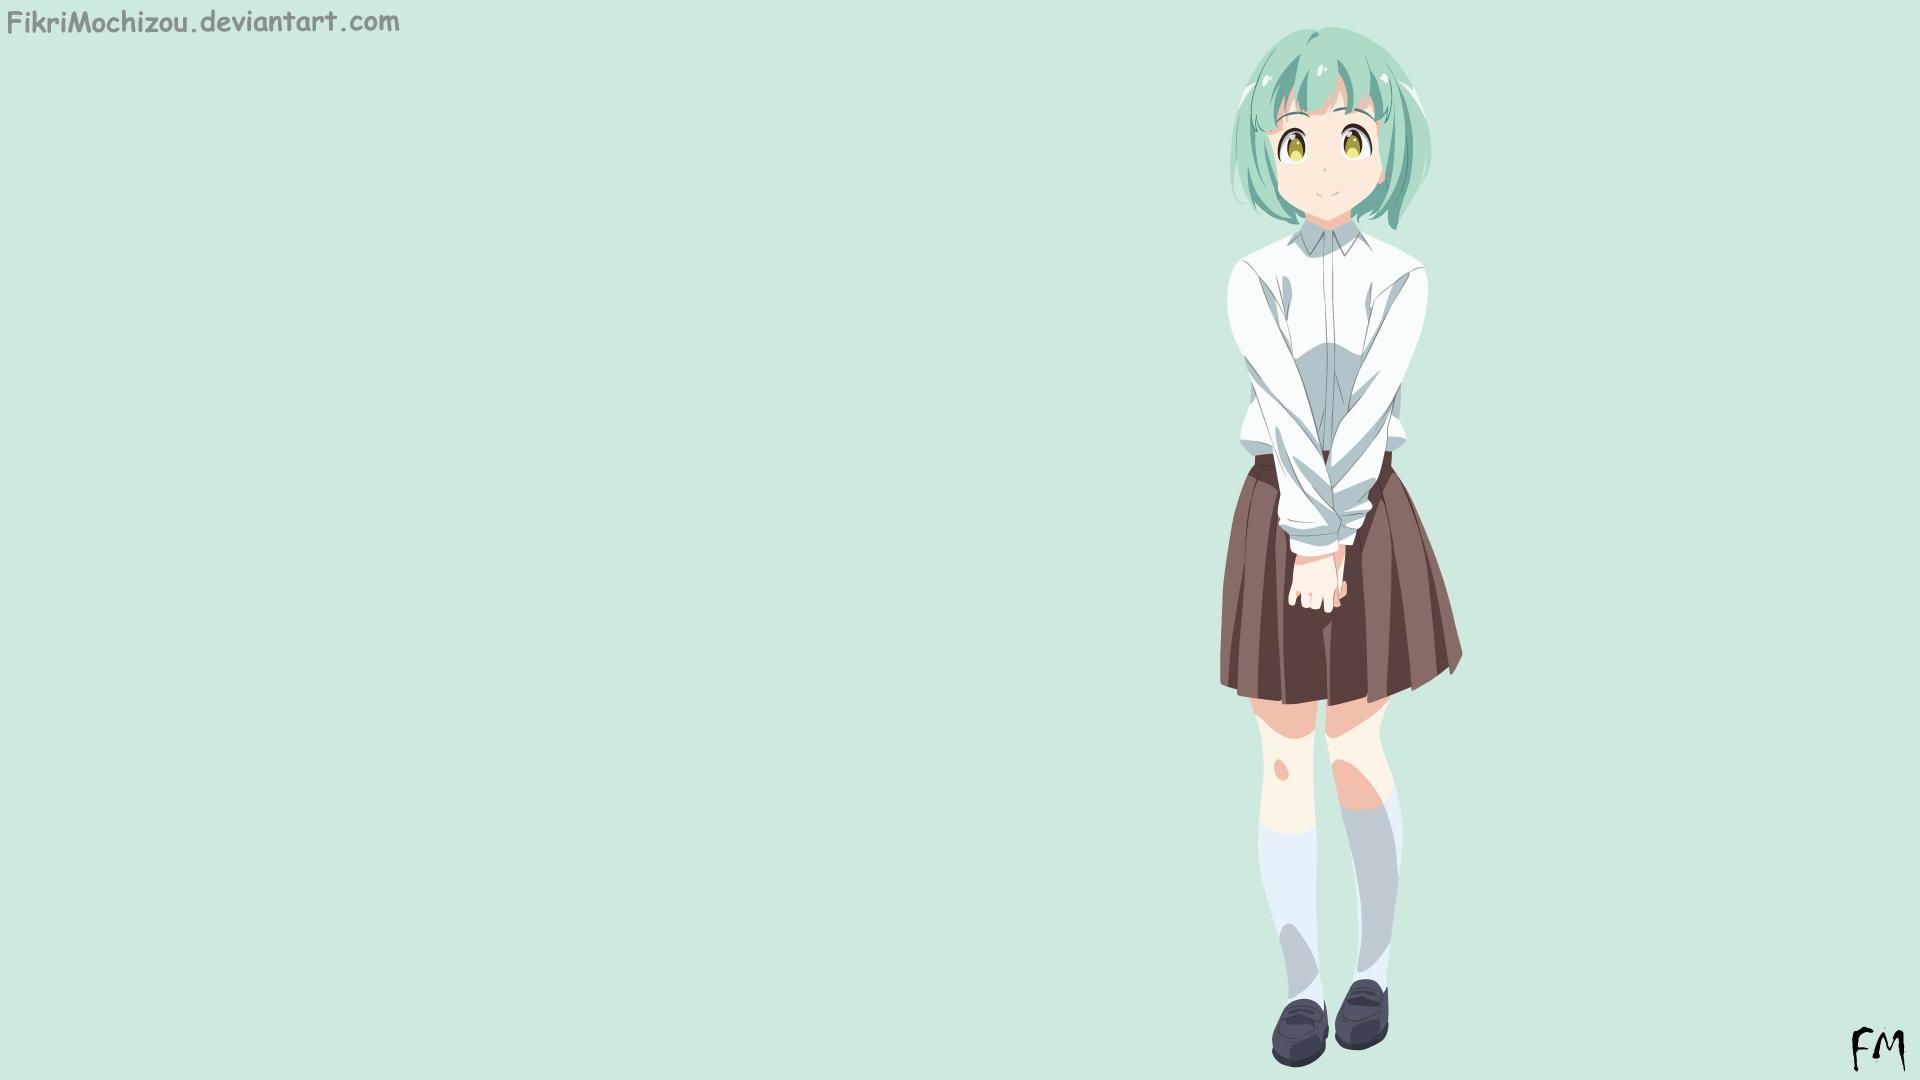 Anime 1920x1080 Demi-chan wa Kataritai anime girls simple background DeviantArt green hair yellow eyes anime socks